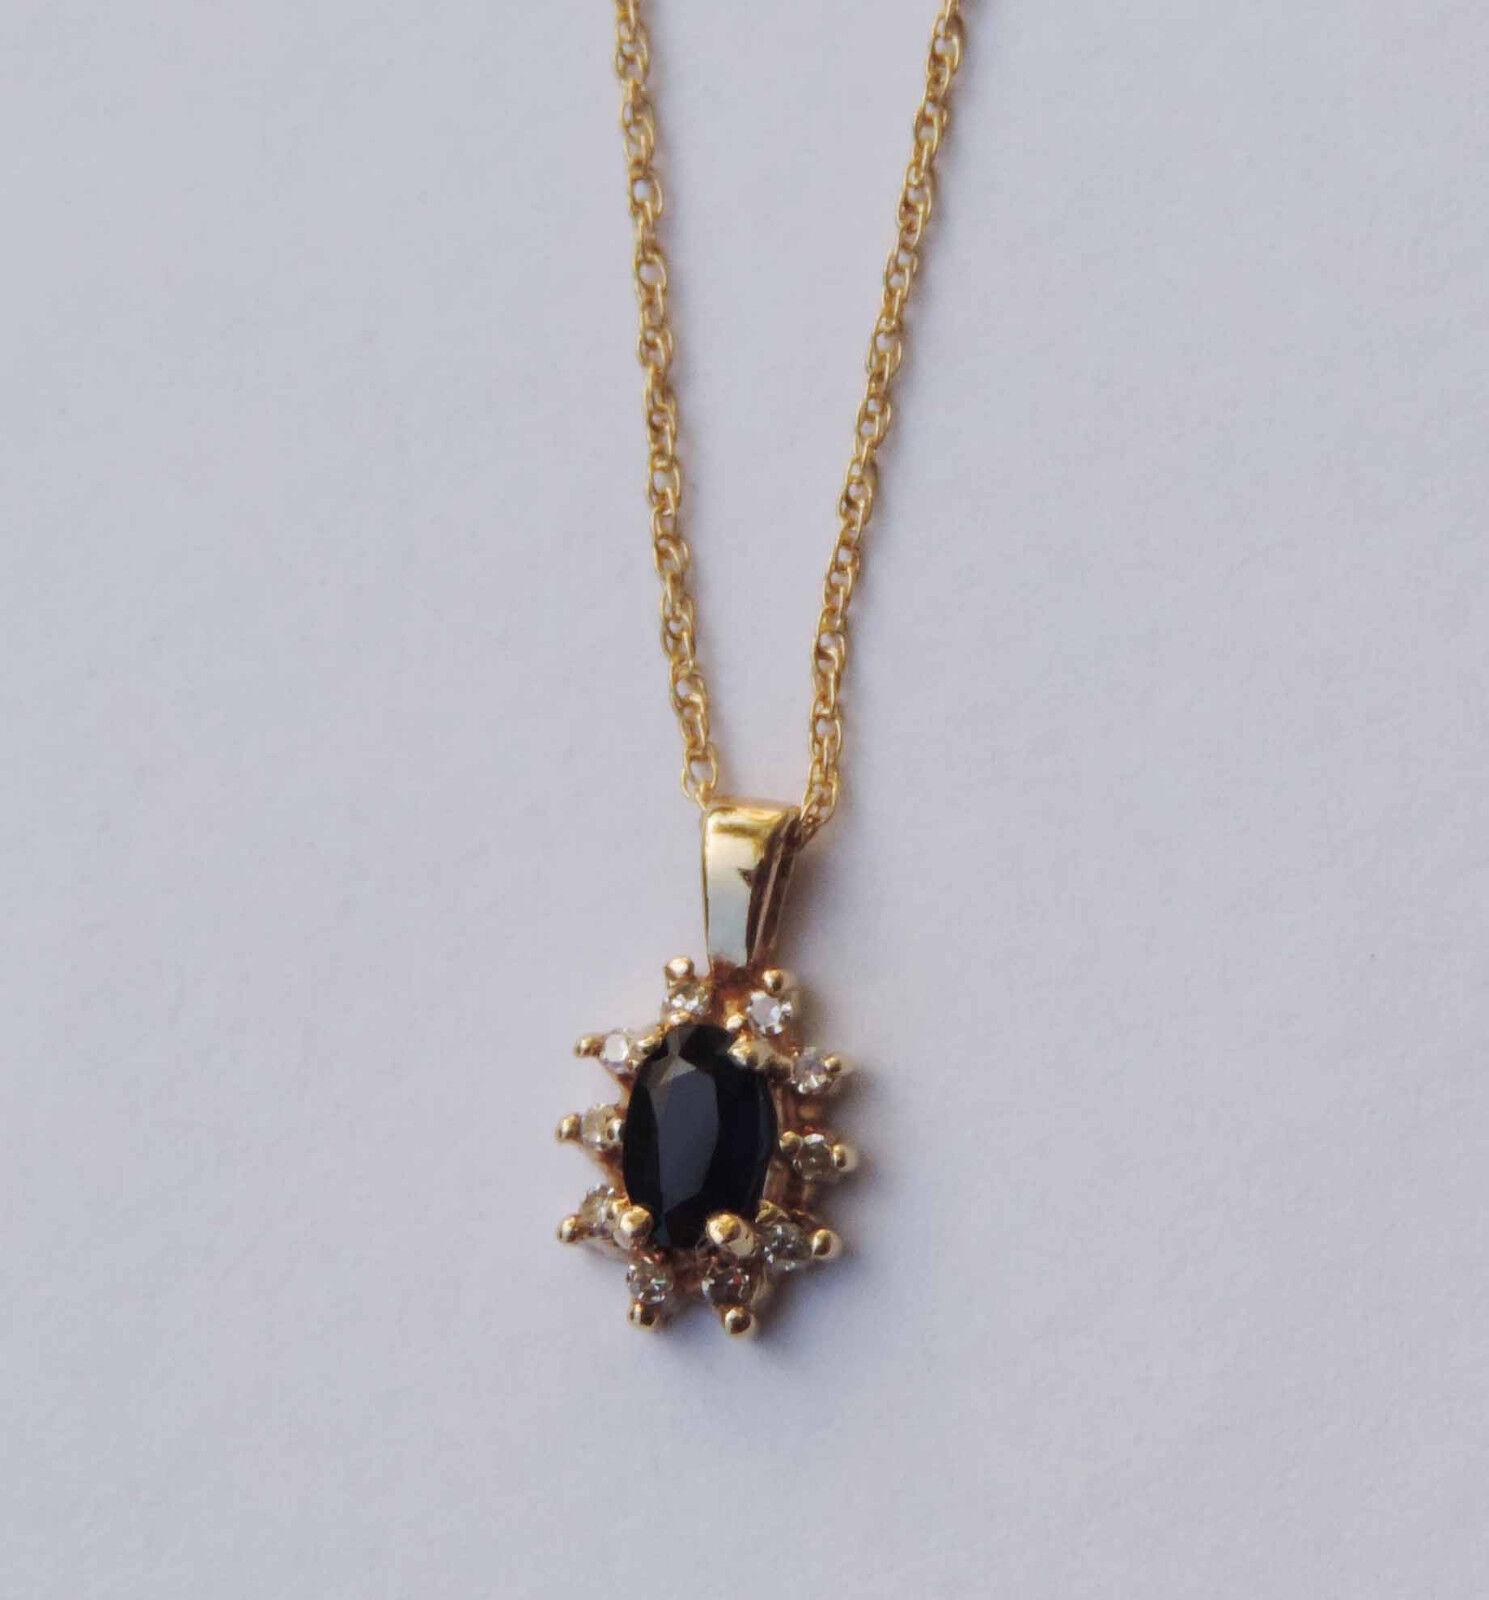 Ladies Oval bluee Sapphire Gemstone Pendant w  10 Dia. Accents - 10k Yellow gold